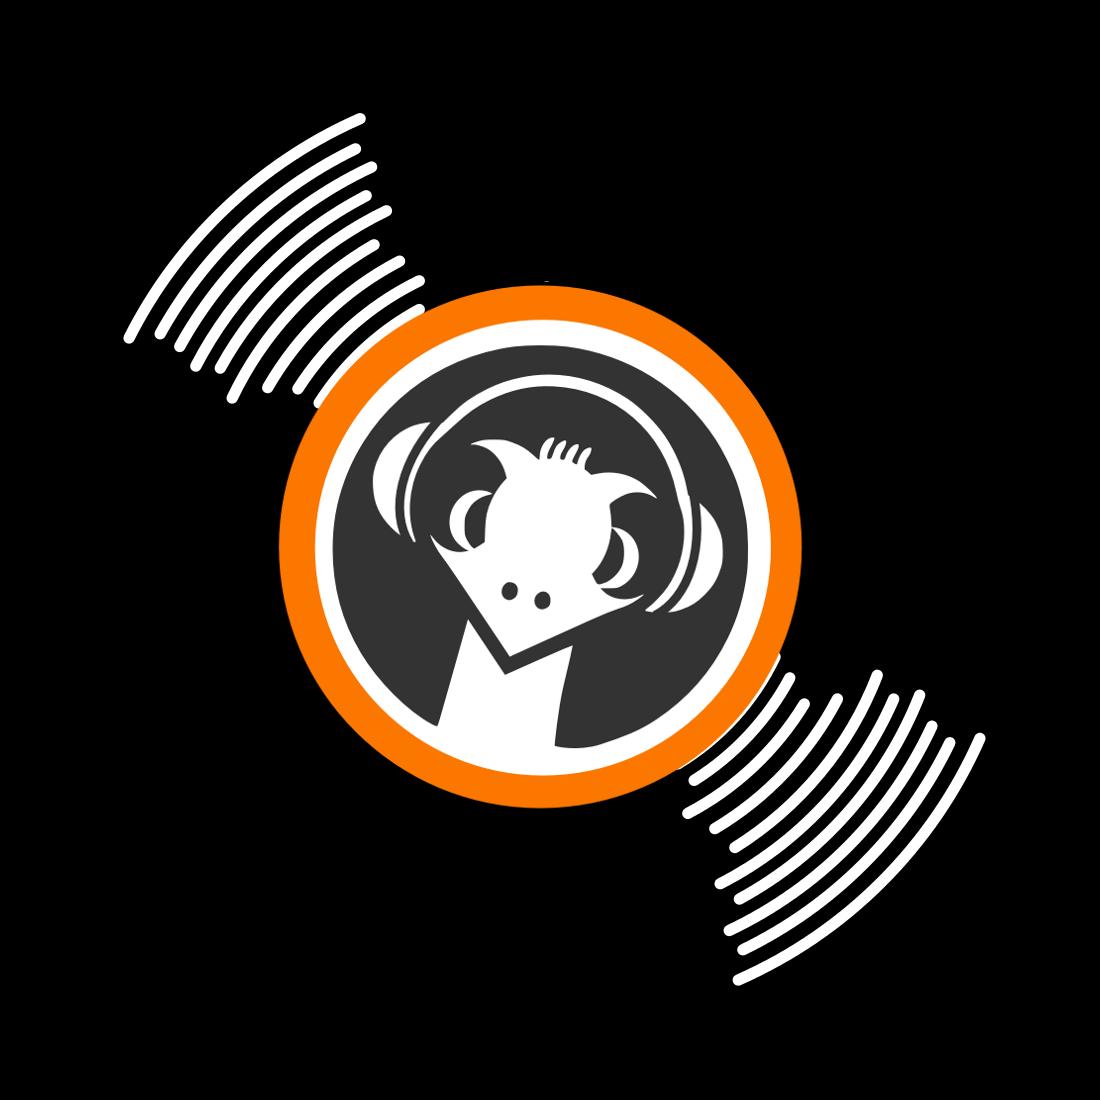 [Die Intellektronische Biparietal Projekt] Inédits